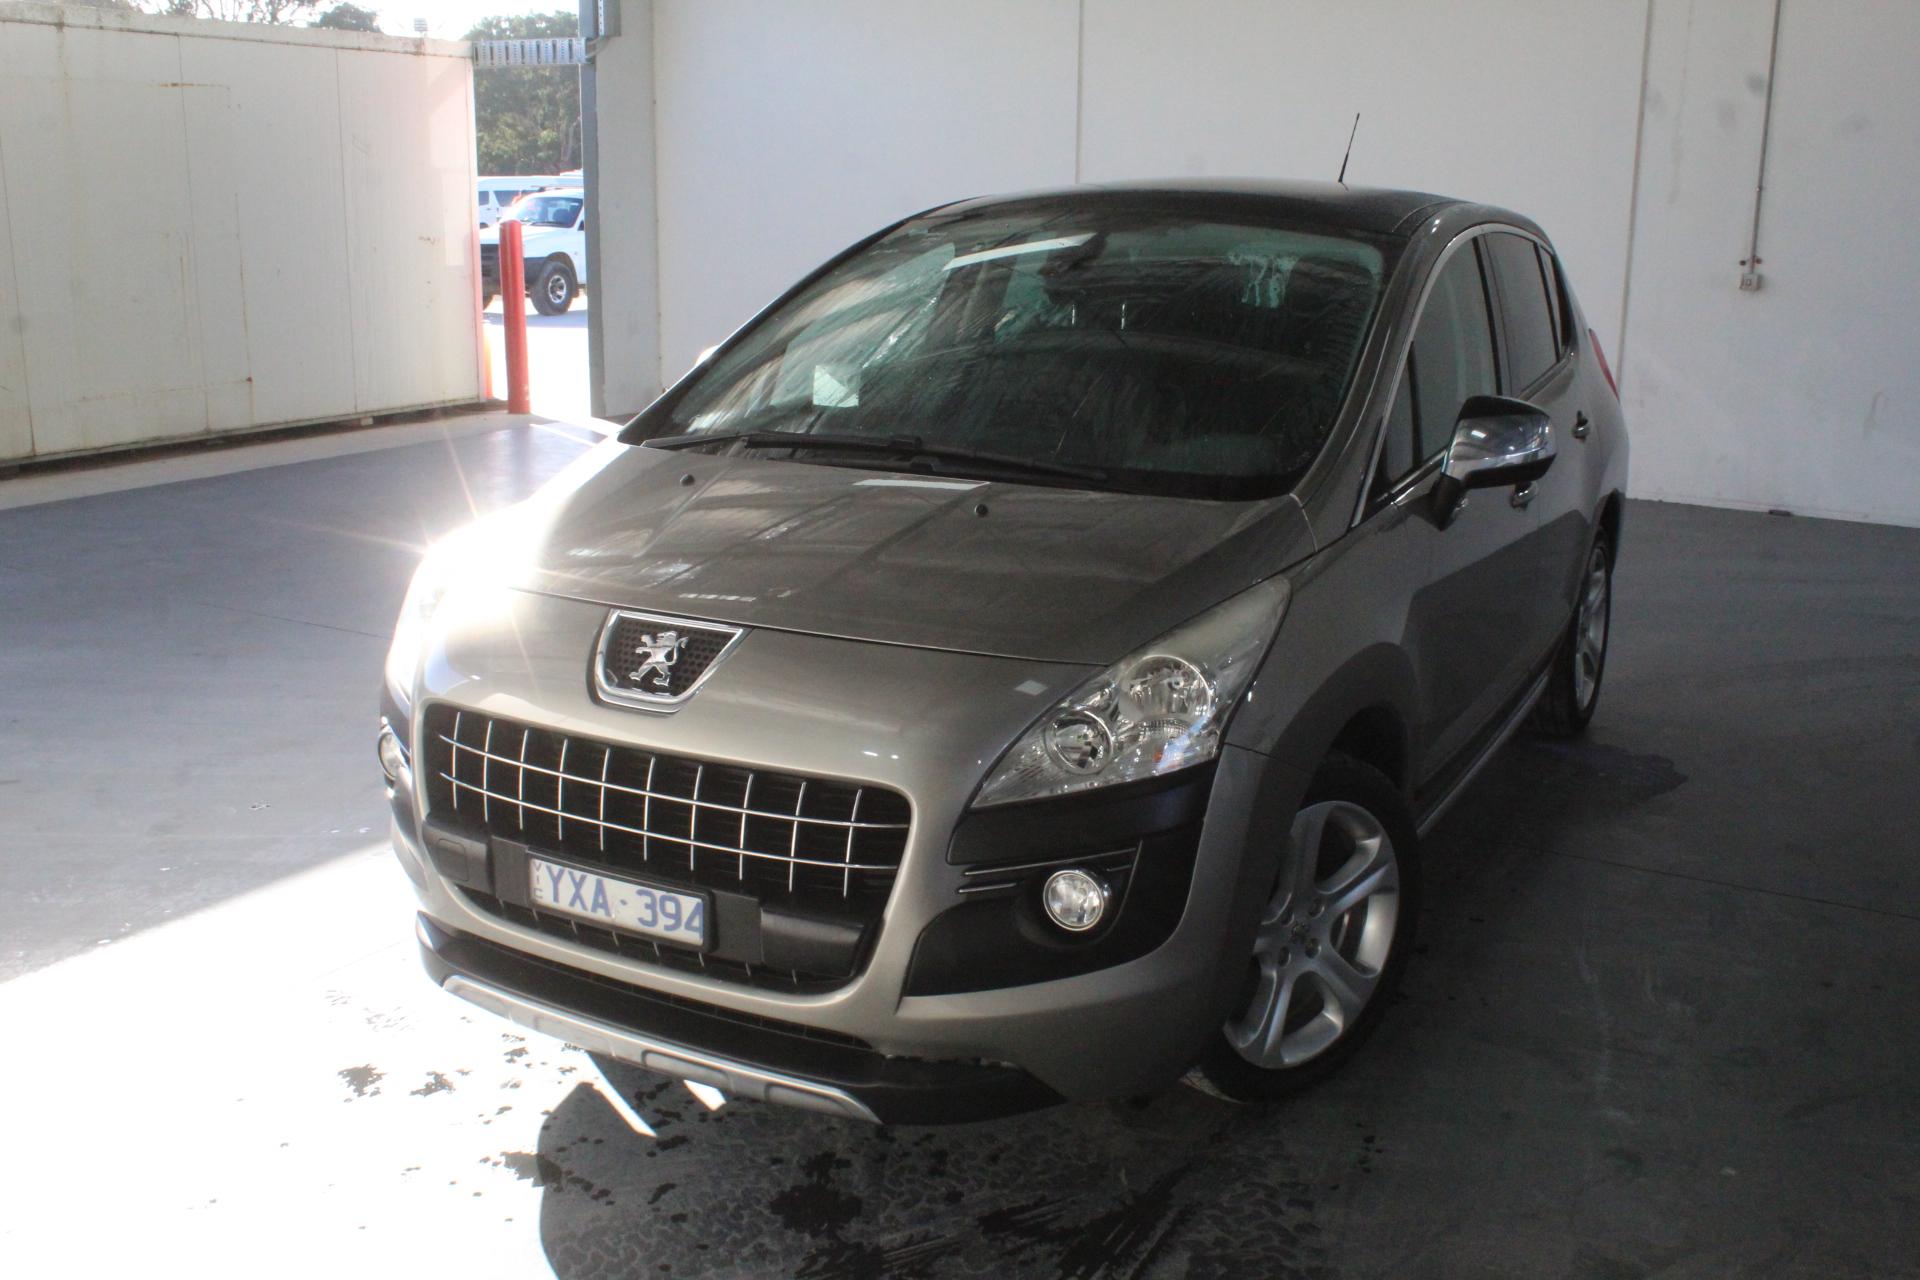 2012 Peugeot 3008 XTE 1.6 Turbo Automatic Hatchback